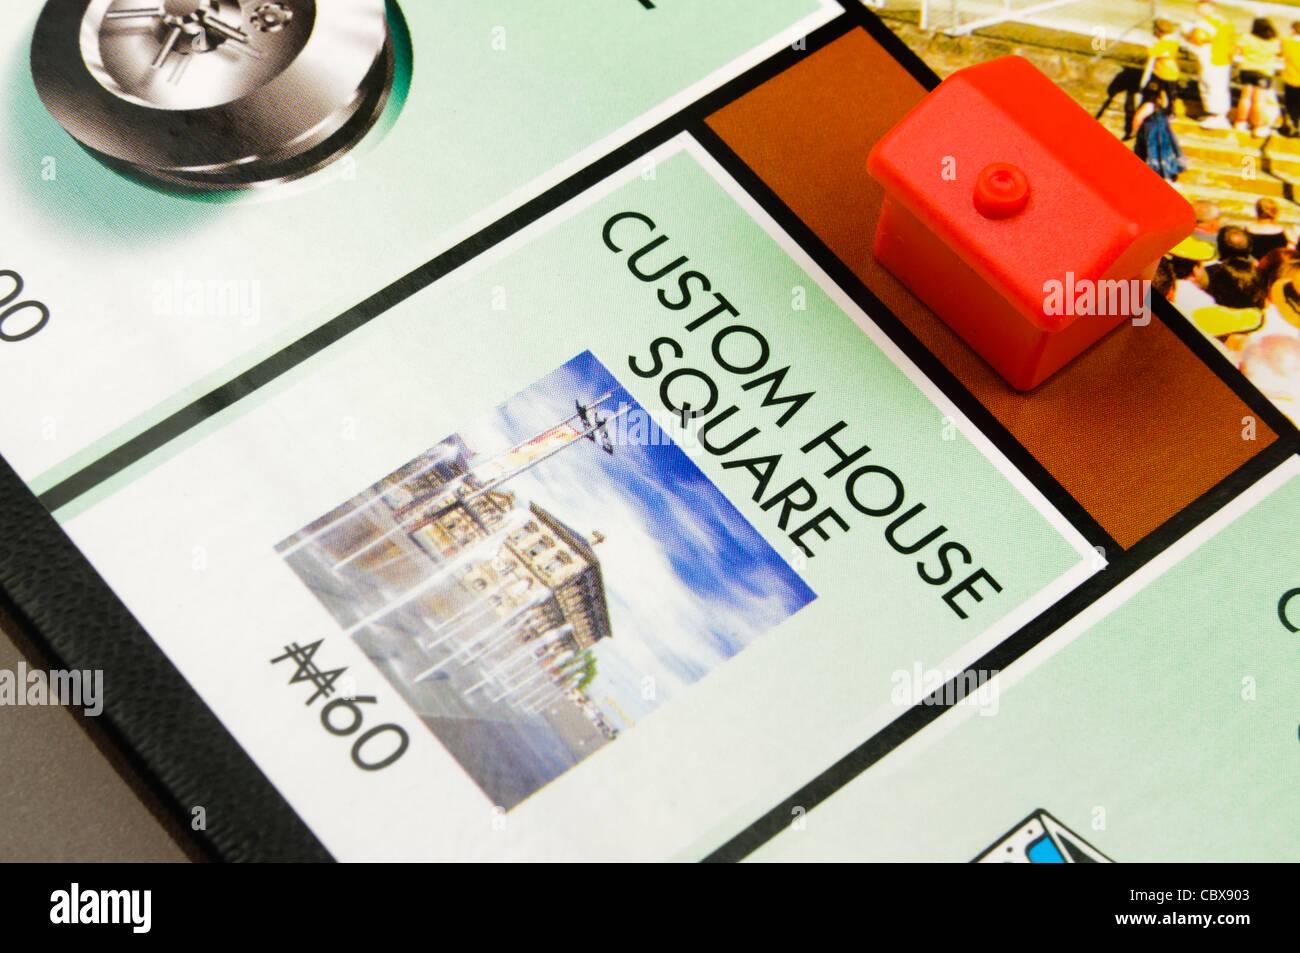 Belfast-Monopol: Bau eines Hotels auf Custom House Square Stockbild